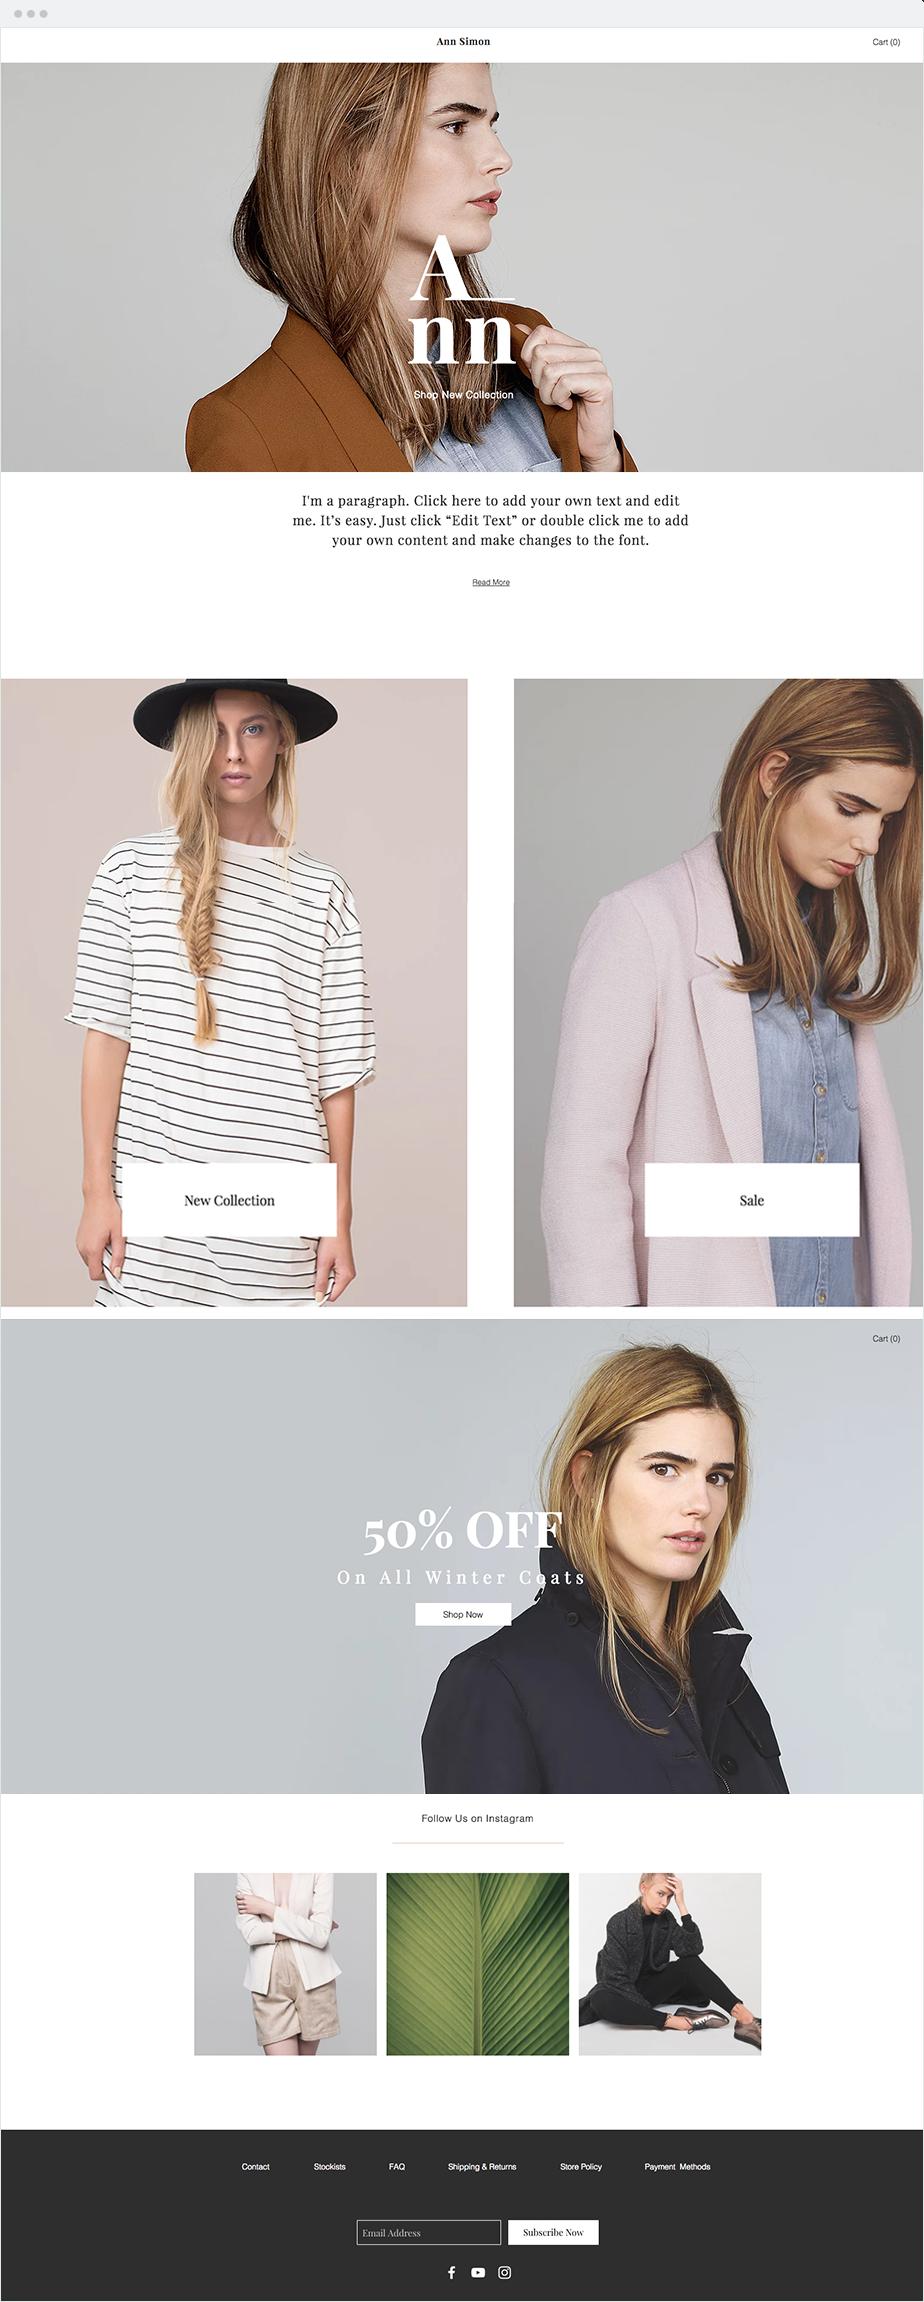 Fashion Designer Boutique Website Template Ecommerce Template Simple Website Design Wix Templates